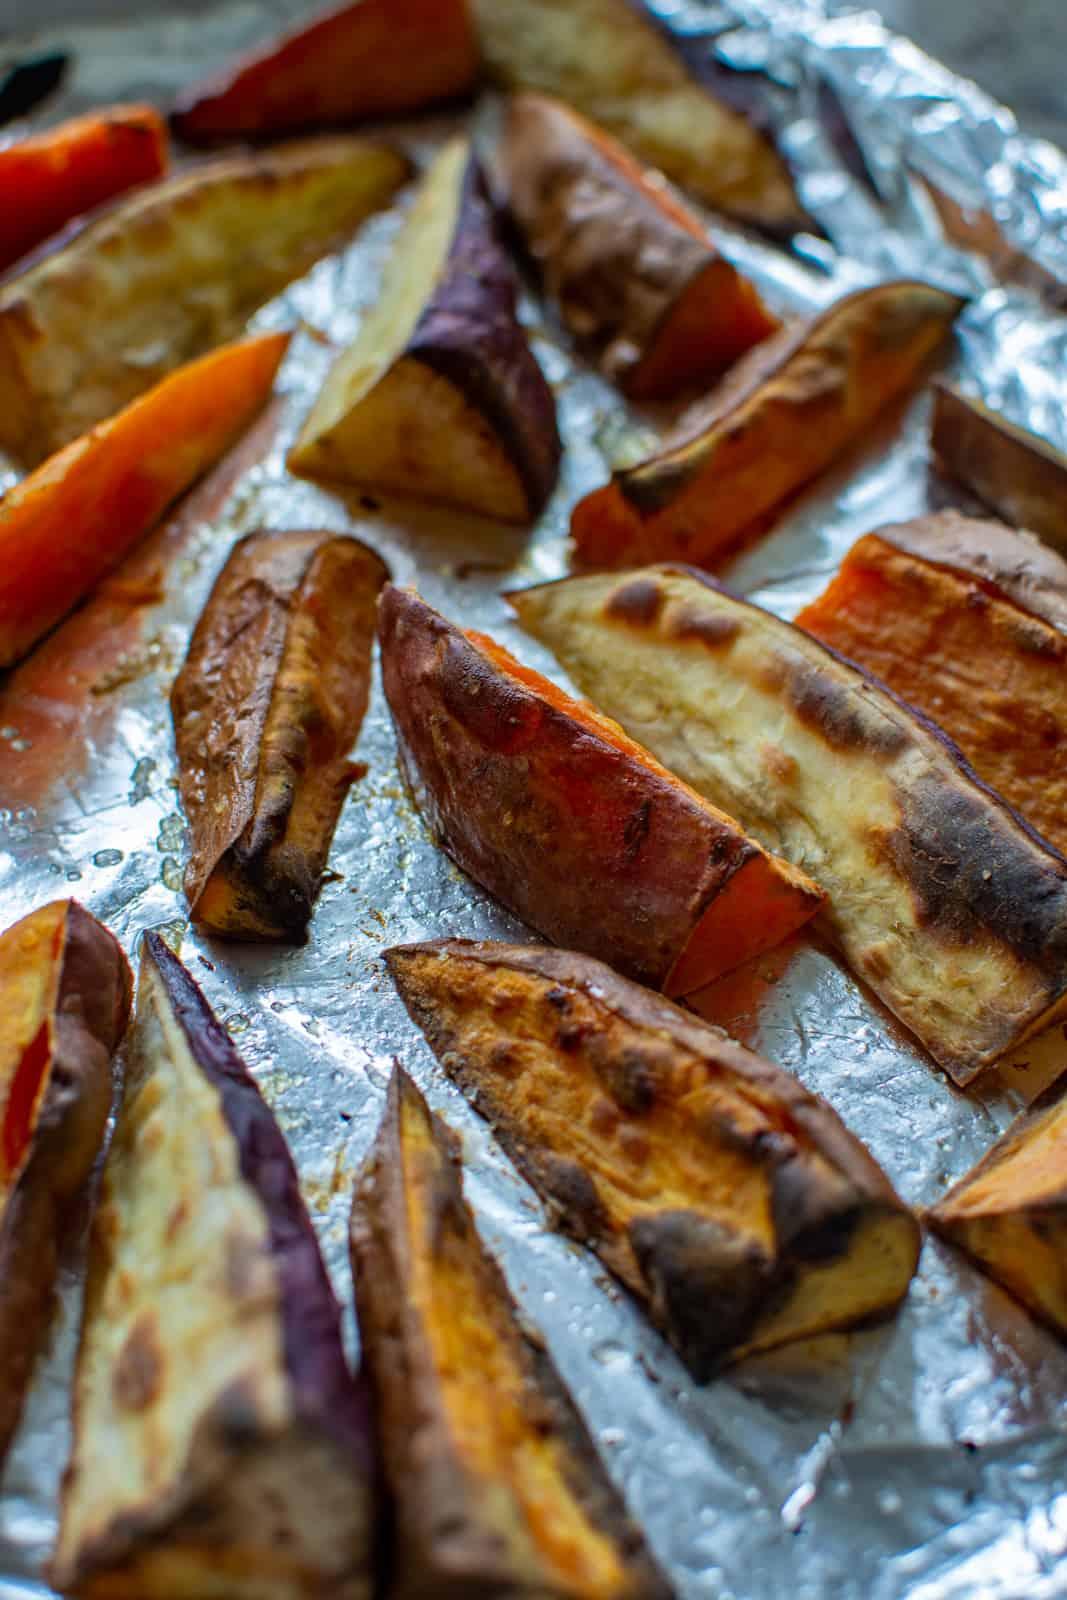 roasted sweet potatoes on a baking tray